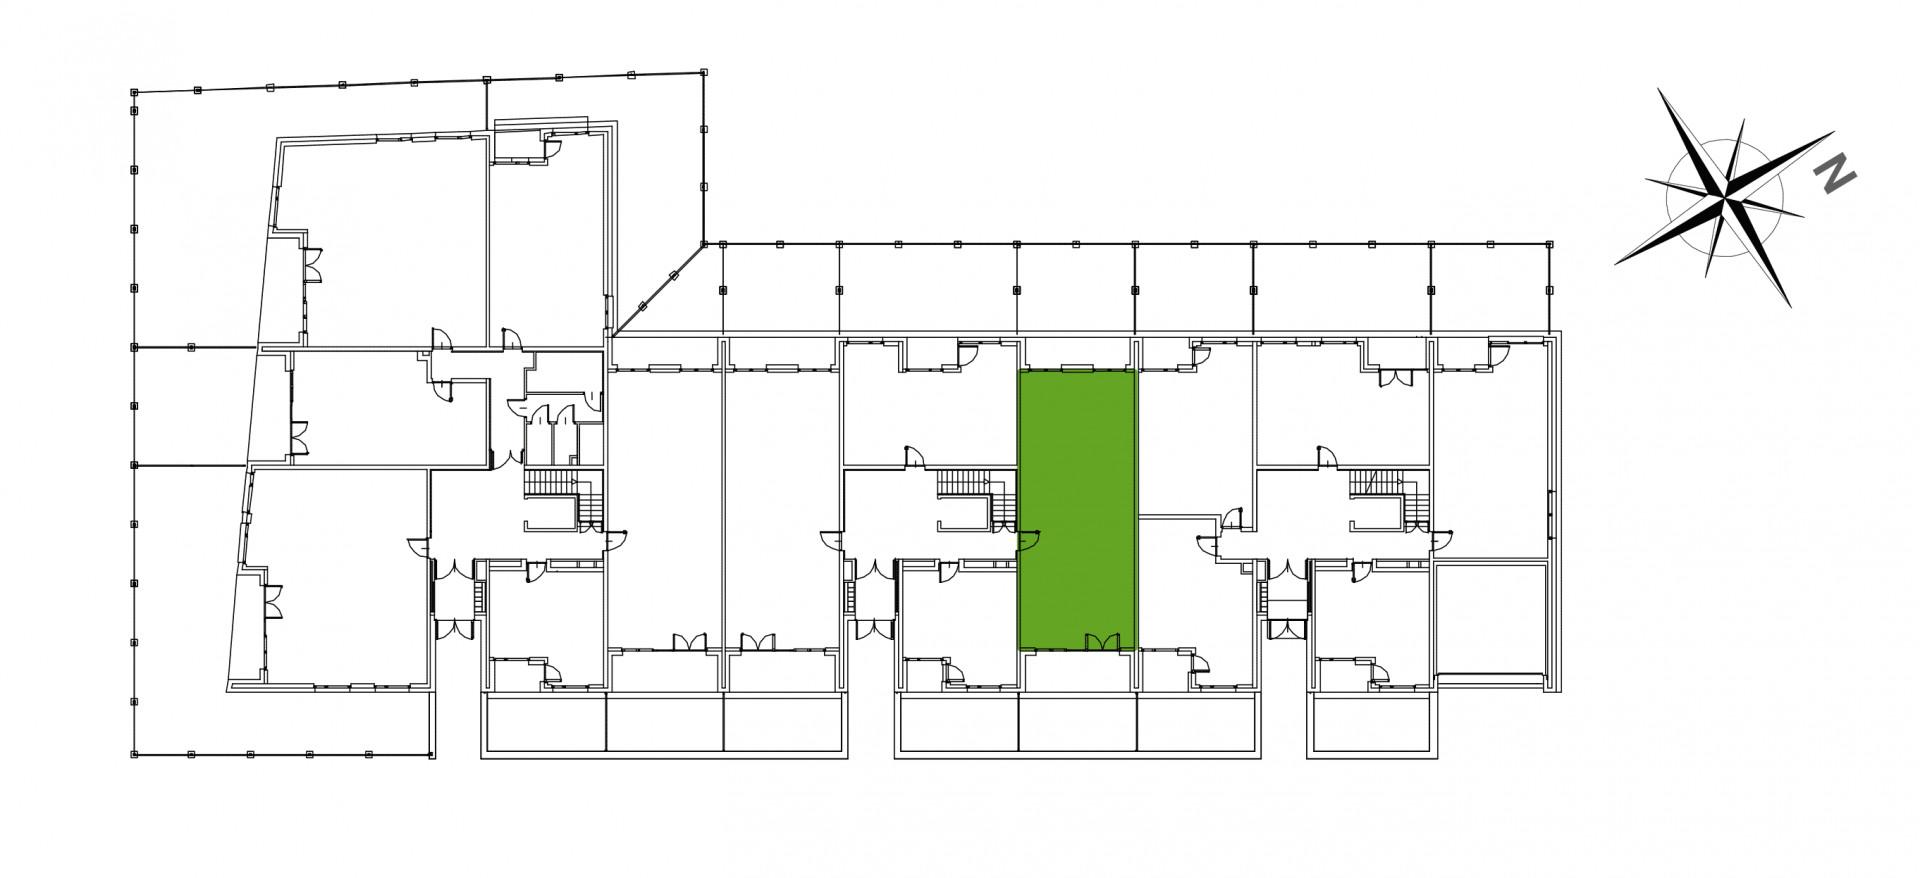 Mazowiecka 72 / apartament nr 26 rzut 2